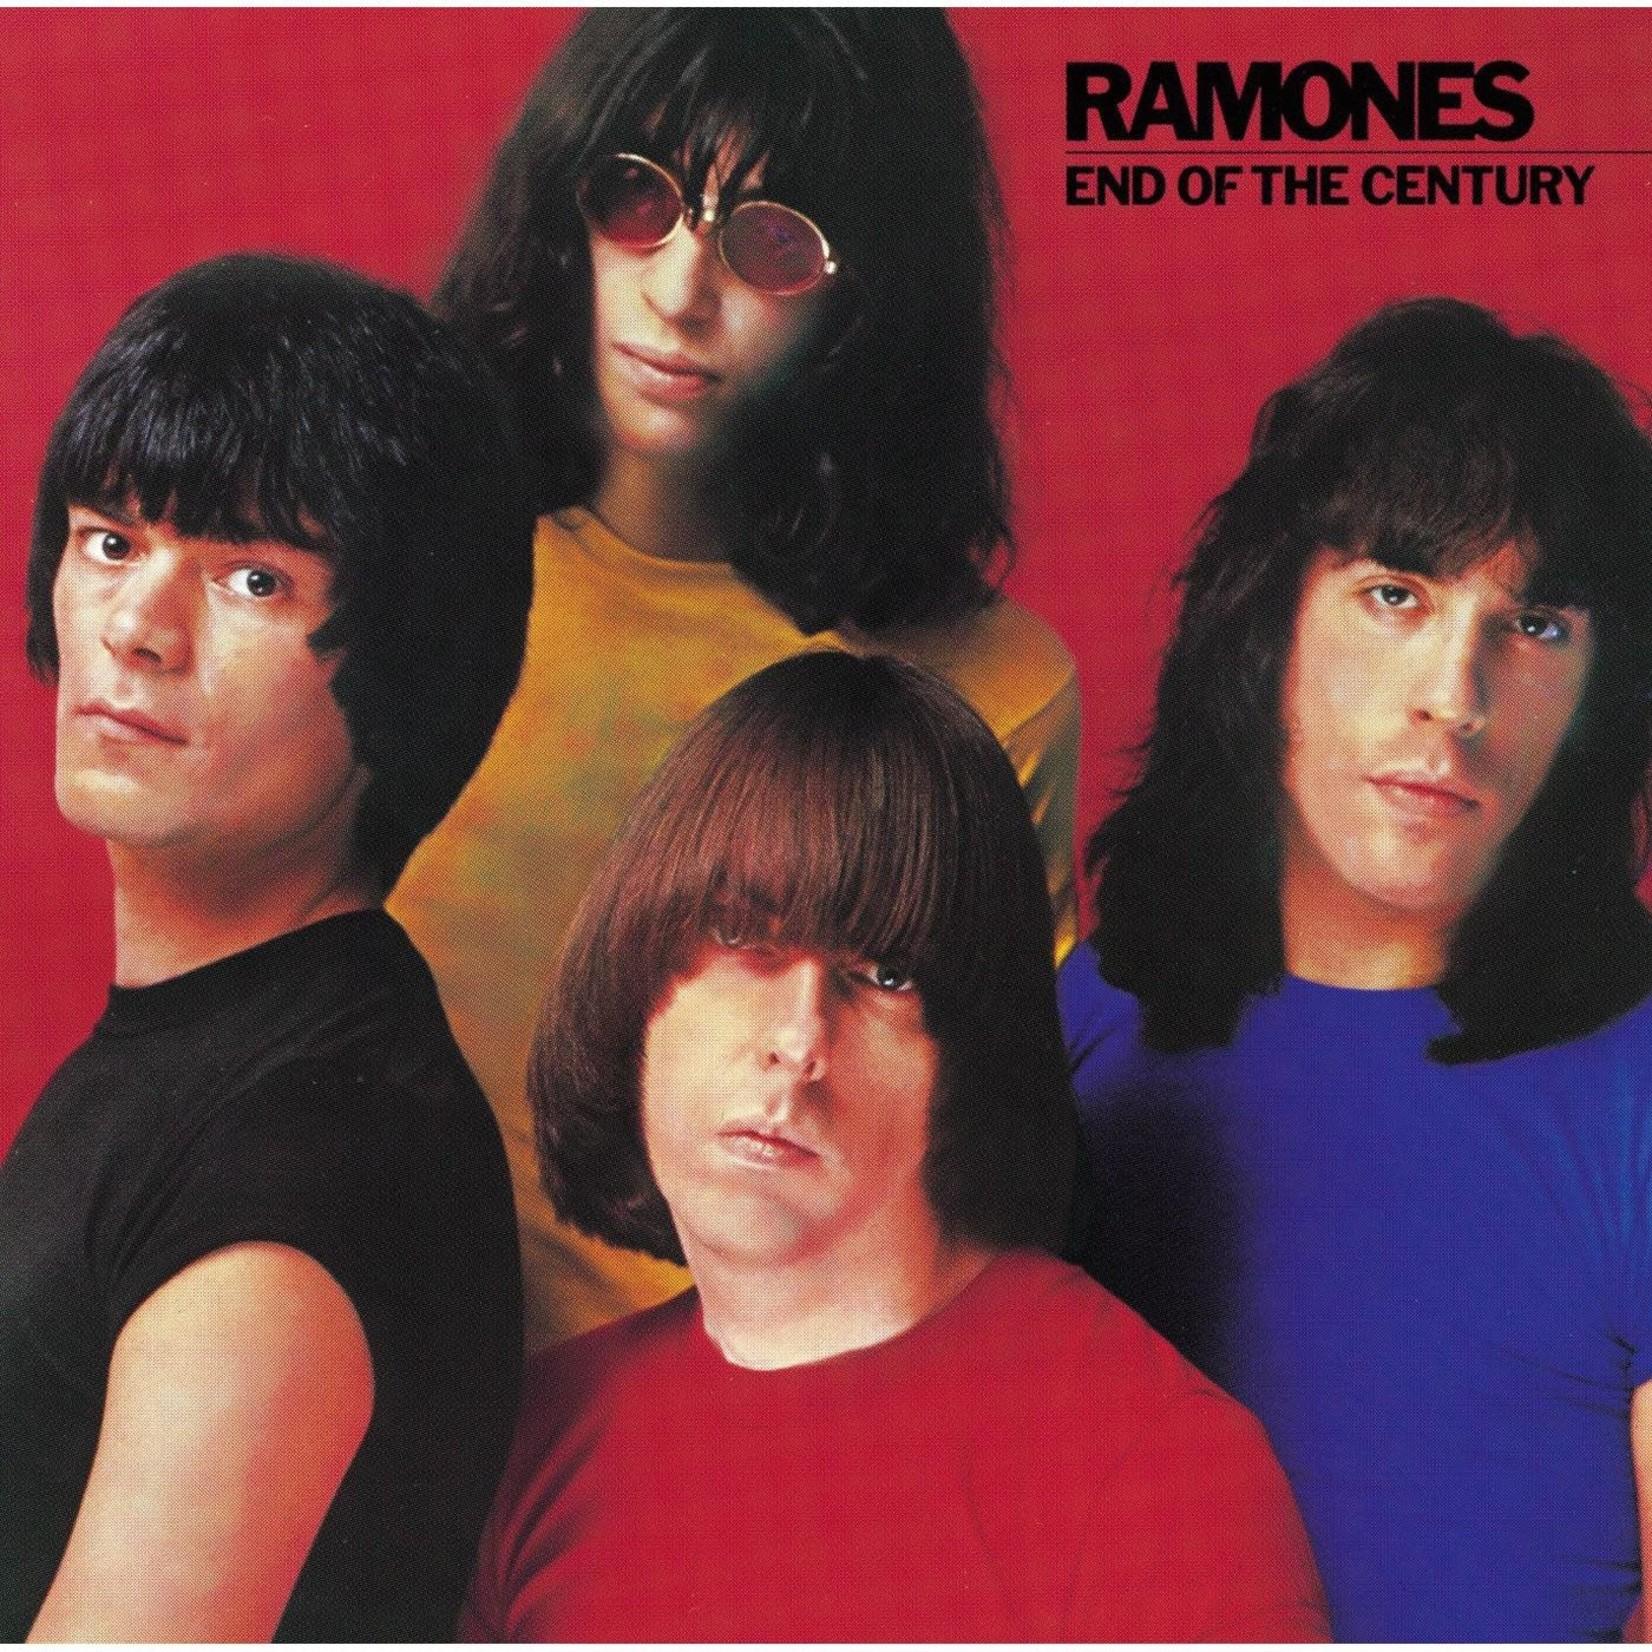 [Vintage] Ramones: End of the Century (original)